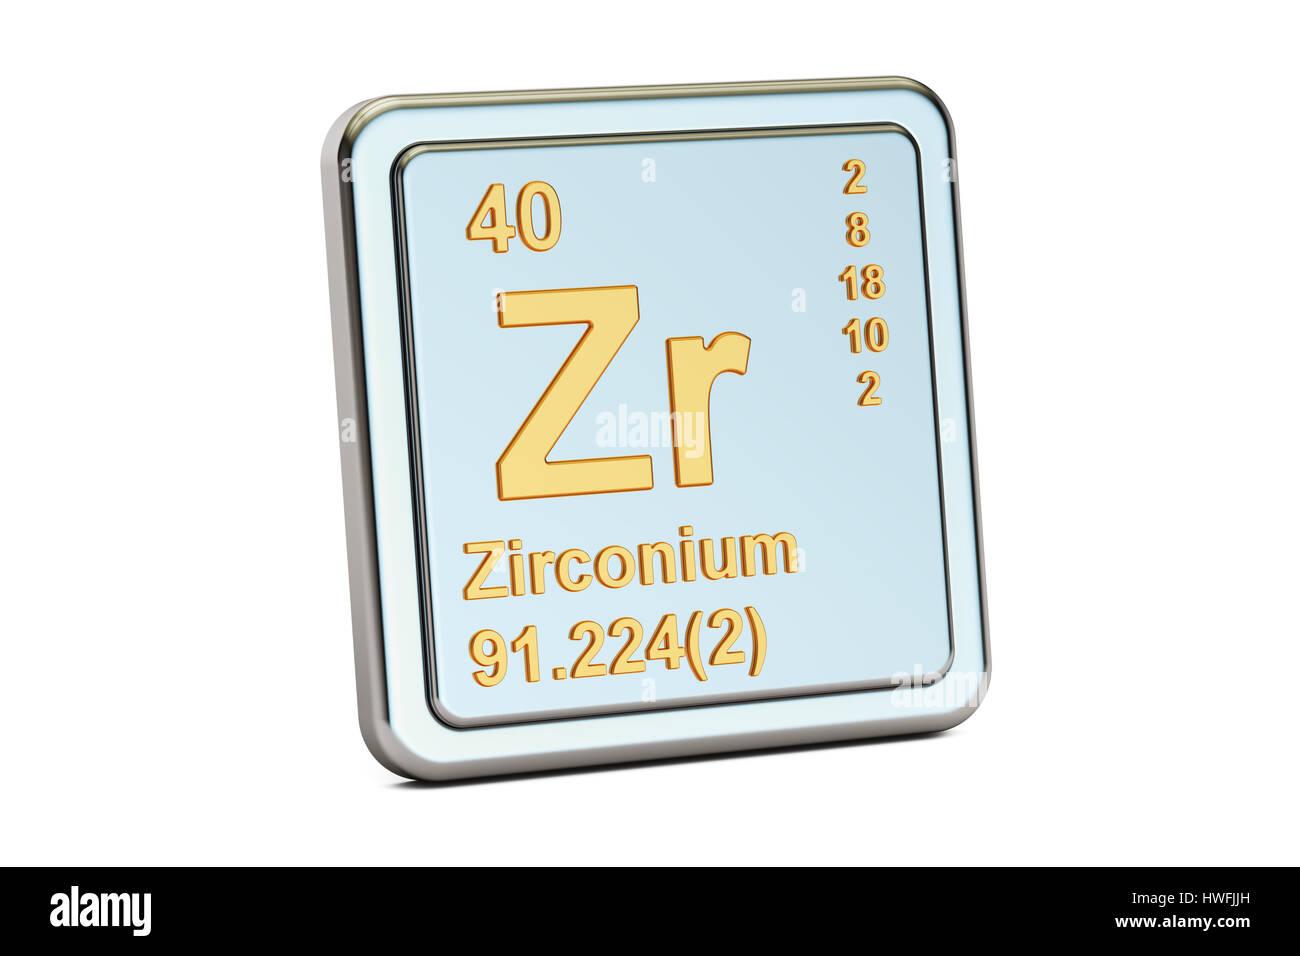 Zirconium zr chemical element sign 3d rendering isolated on stock photo zirconium zr chemical element sign 3d rendering isolated on white background gamestrikefo Images